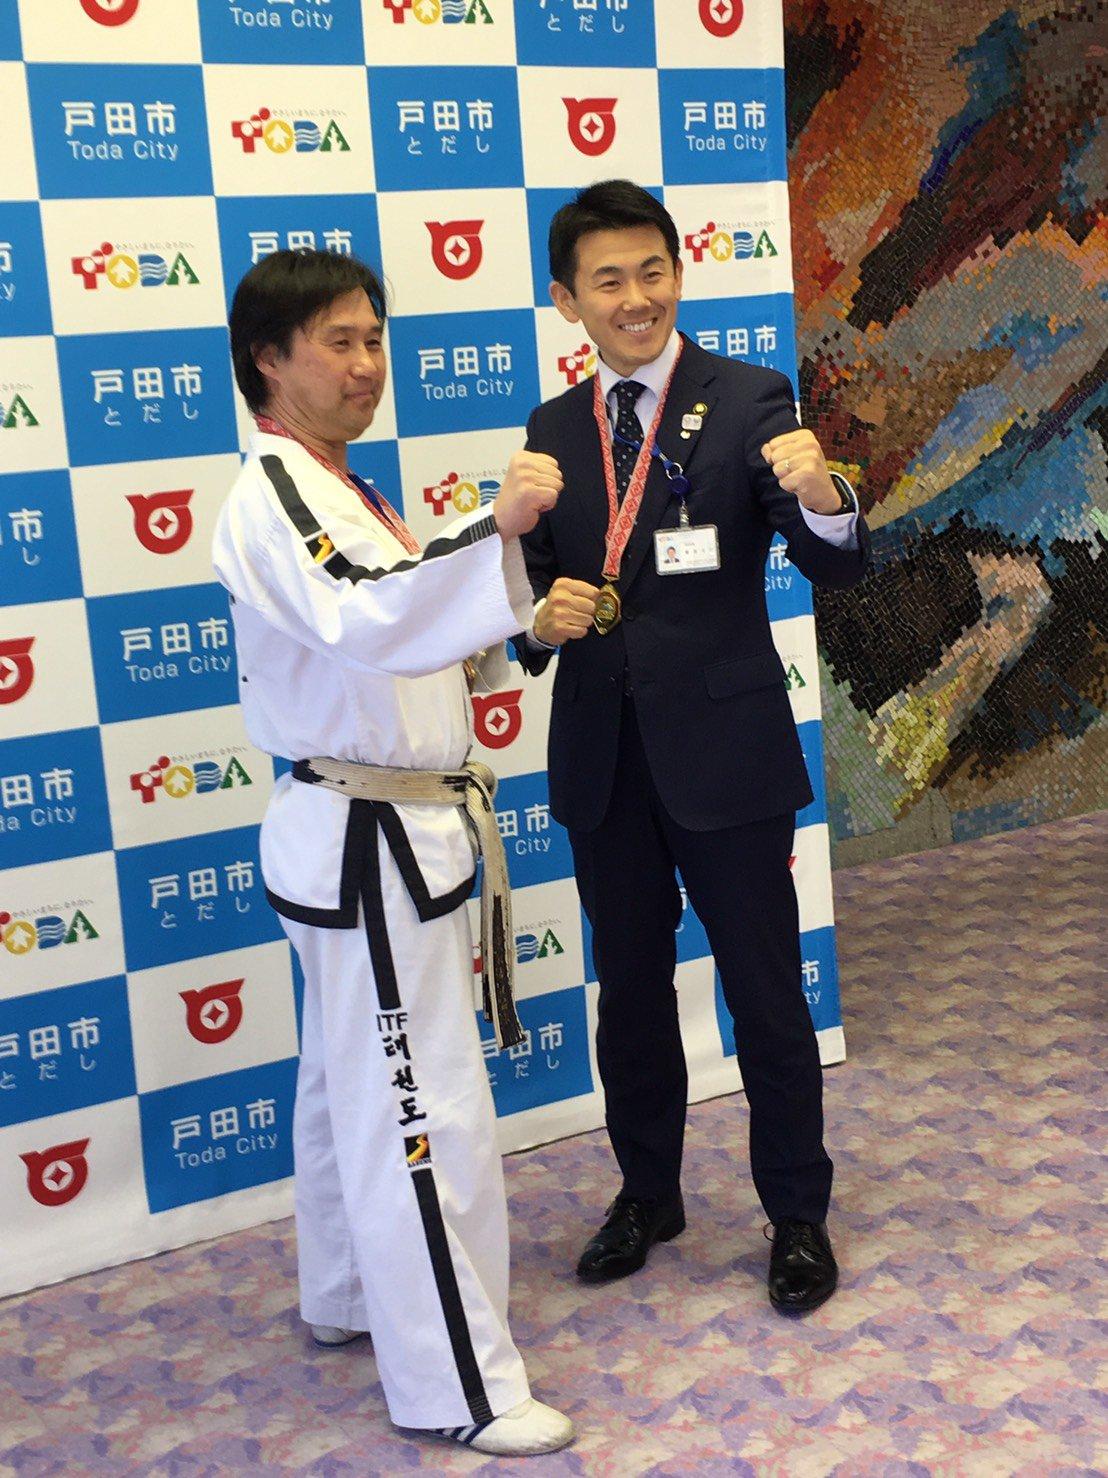 朴禎賢師範、戸田市長を表敬訪問